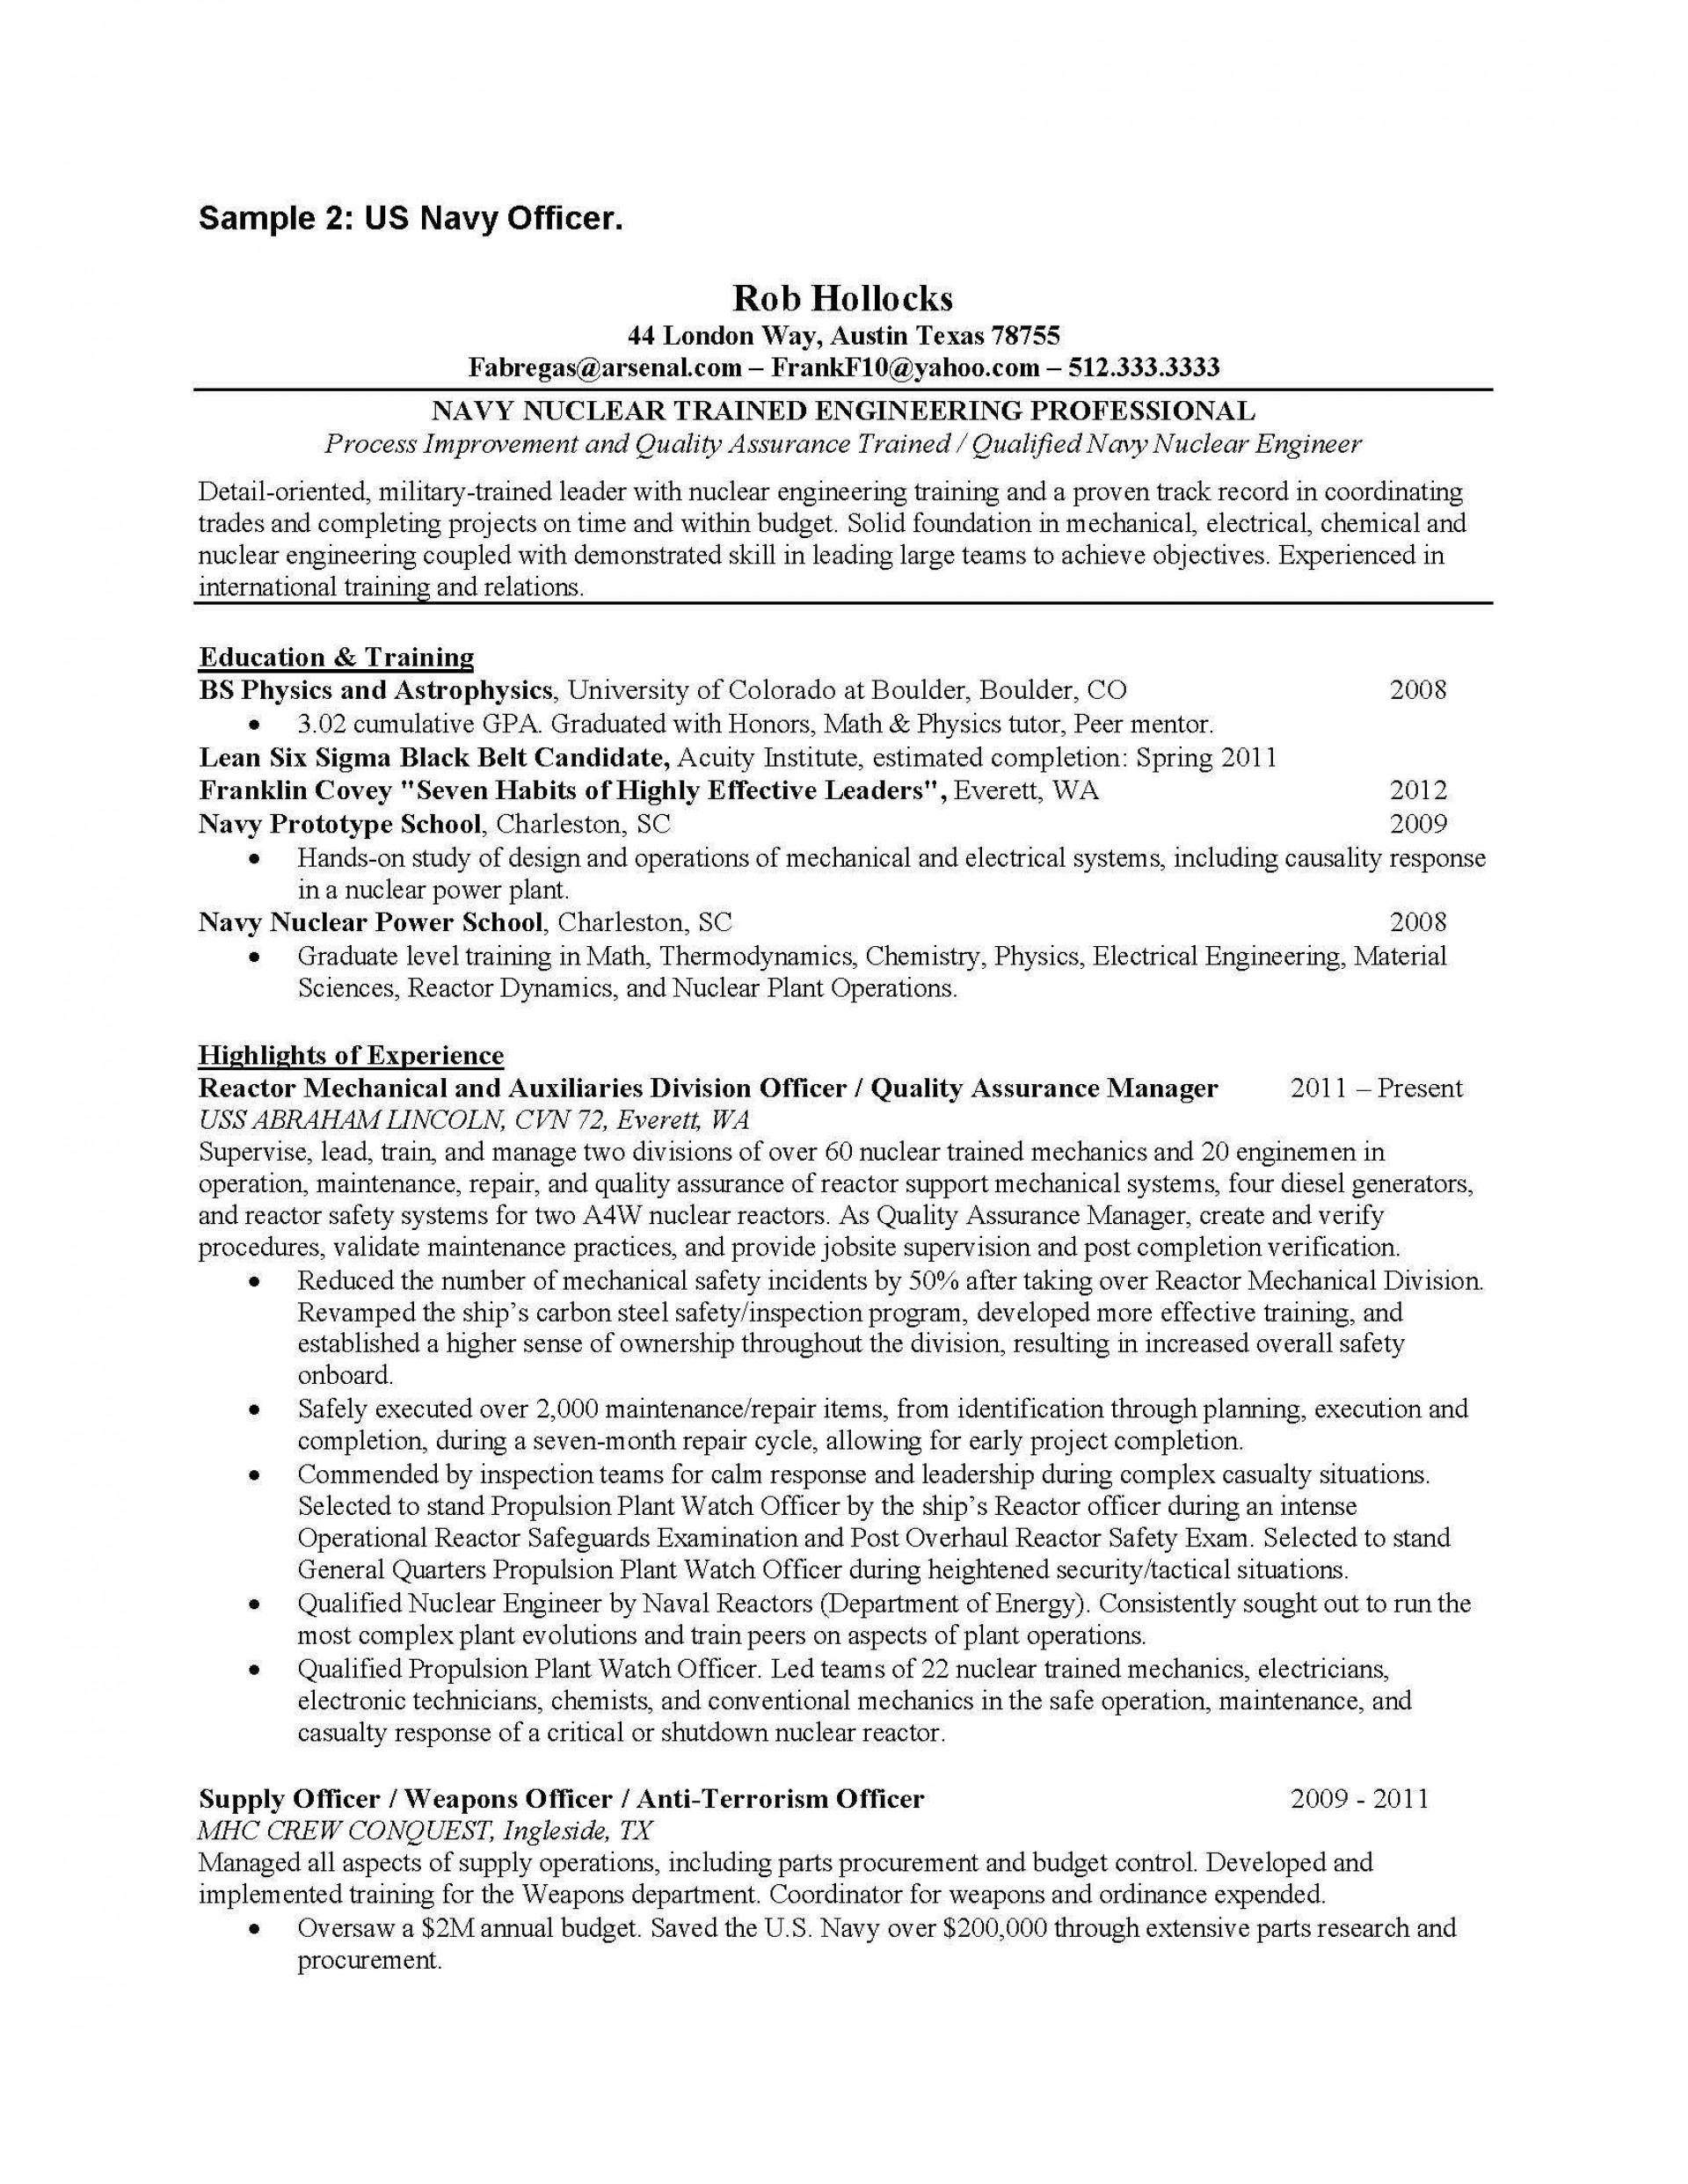 Advertising college essay writing